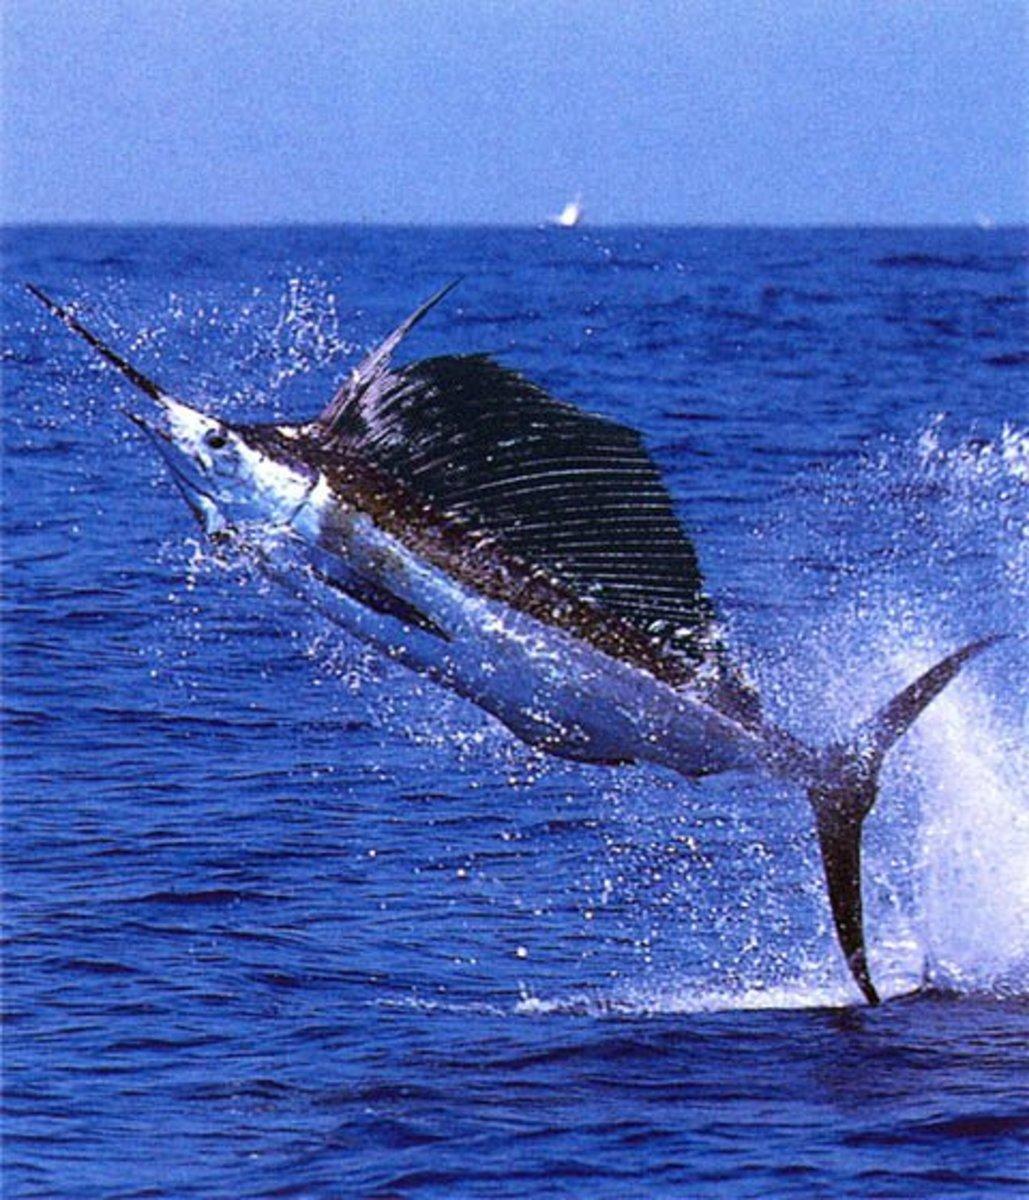 Magnificent Broadbill Swordfish